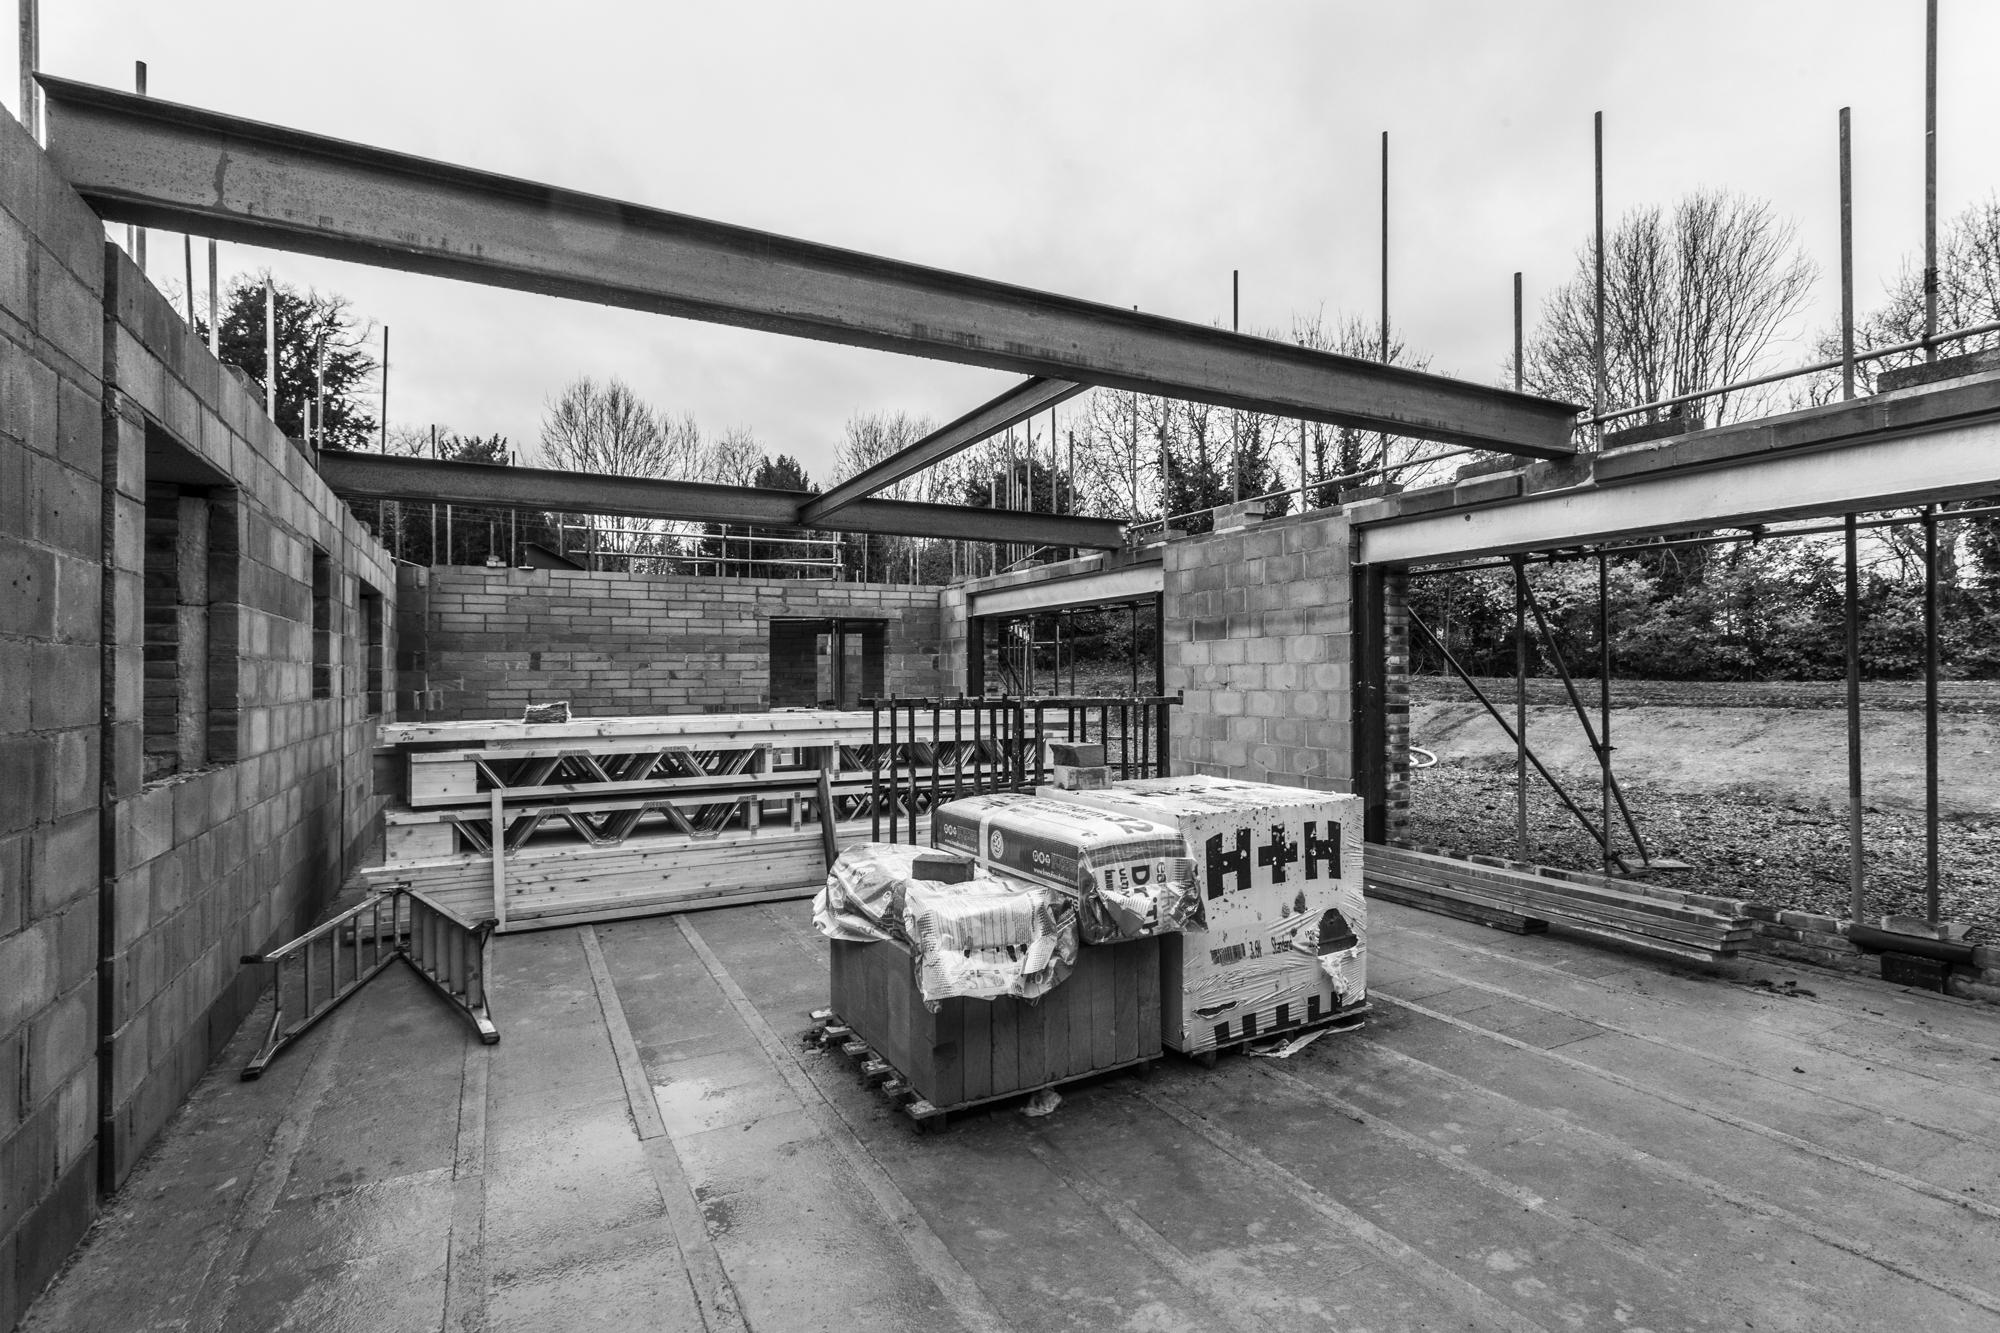 FlinthurstHouse_Construction_02.jpg